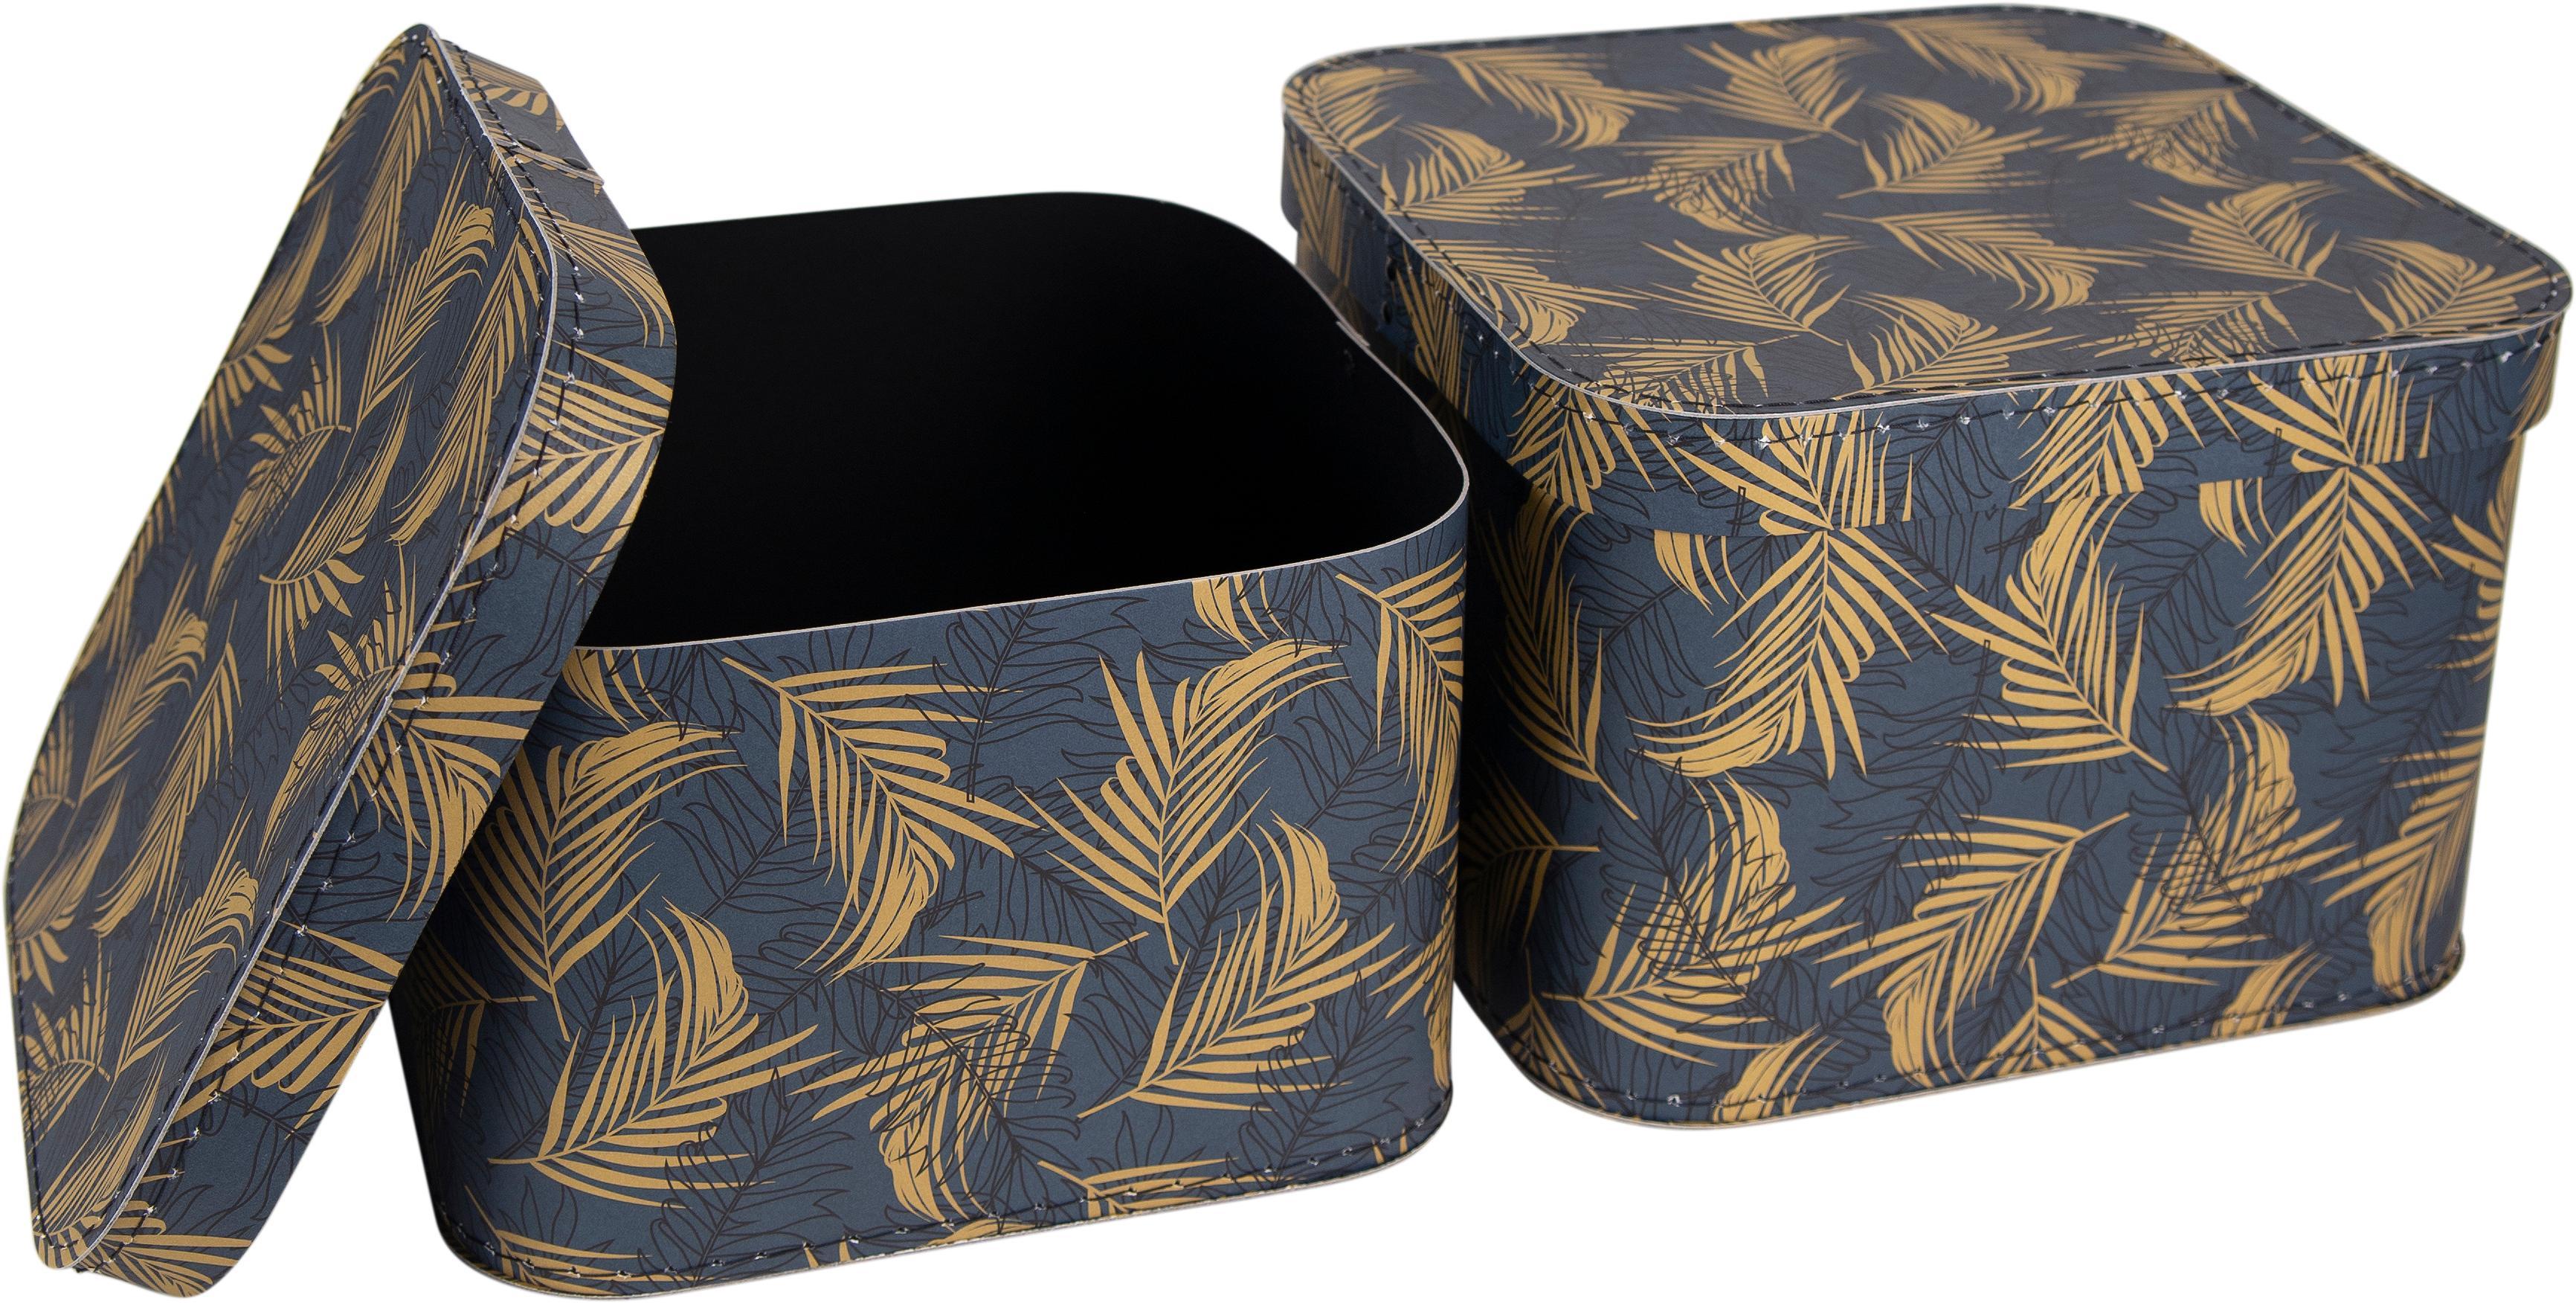 Set de cajas Ludvig, 2pzas., Cartón laminado macizo, Dorado, gris azulado, Tamaños diferentes